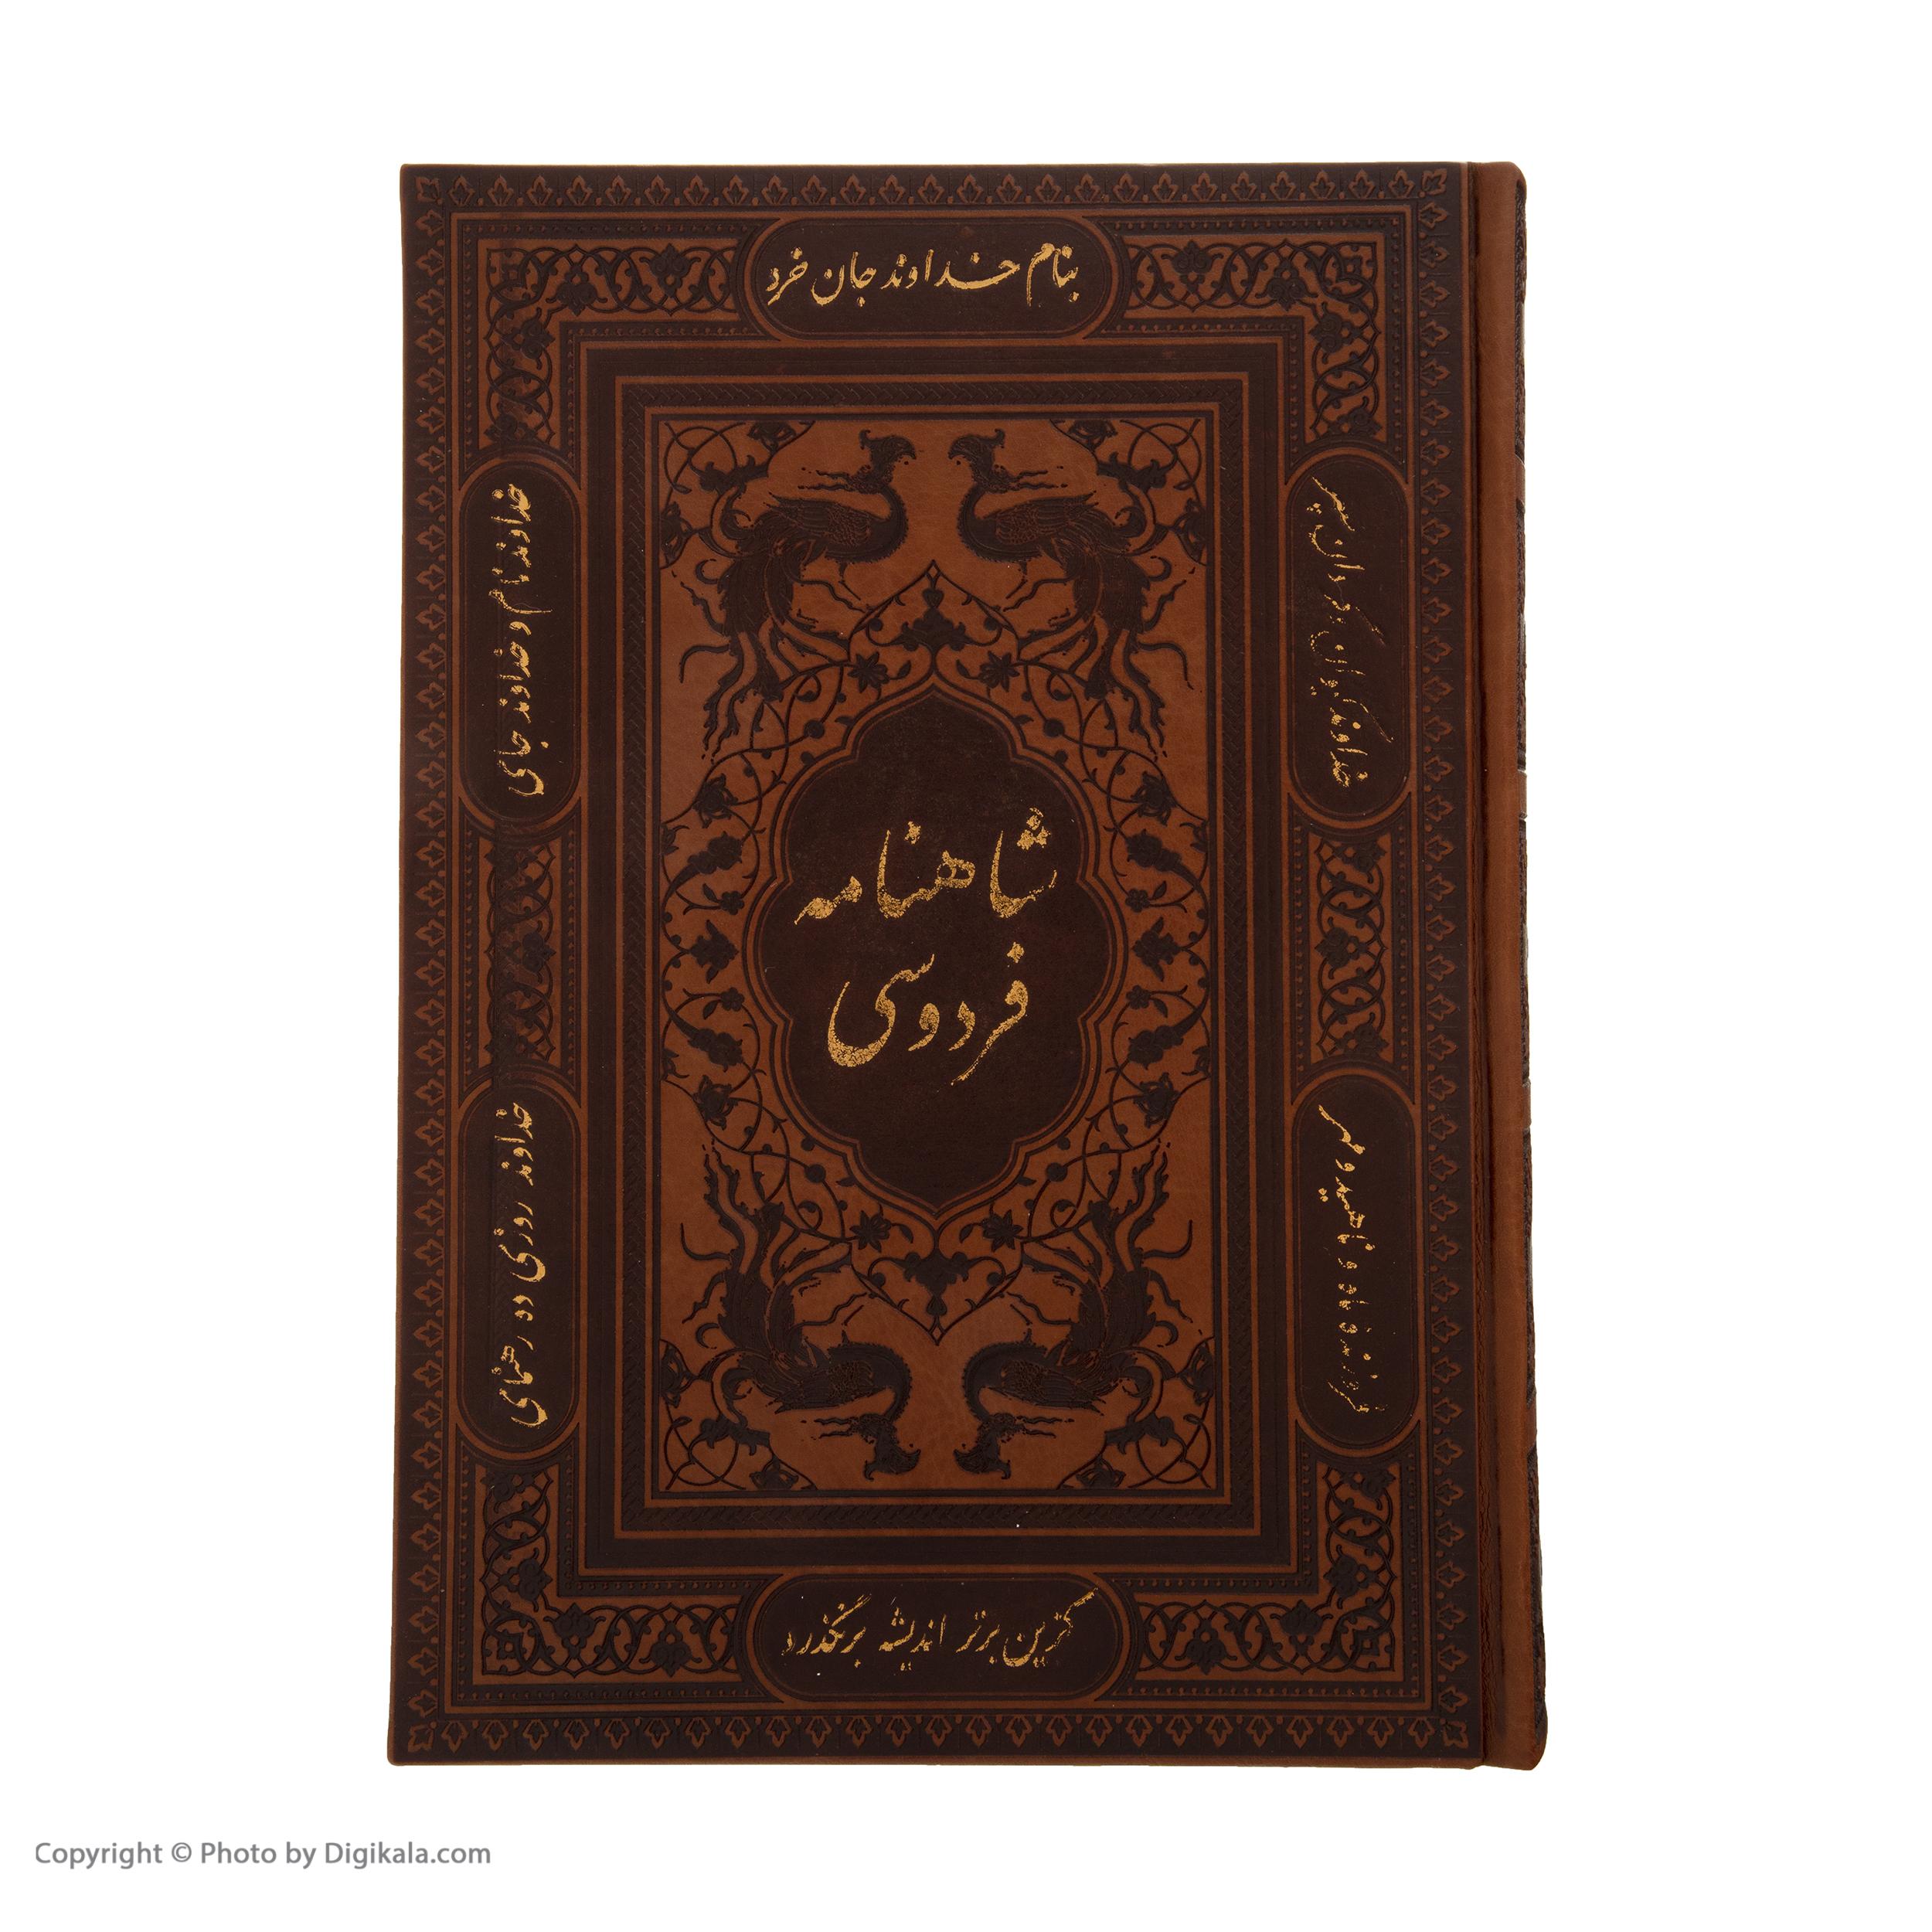 Ferdowsi shahnameh book